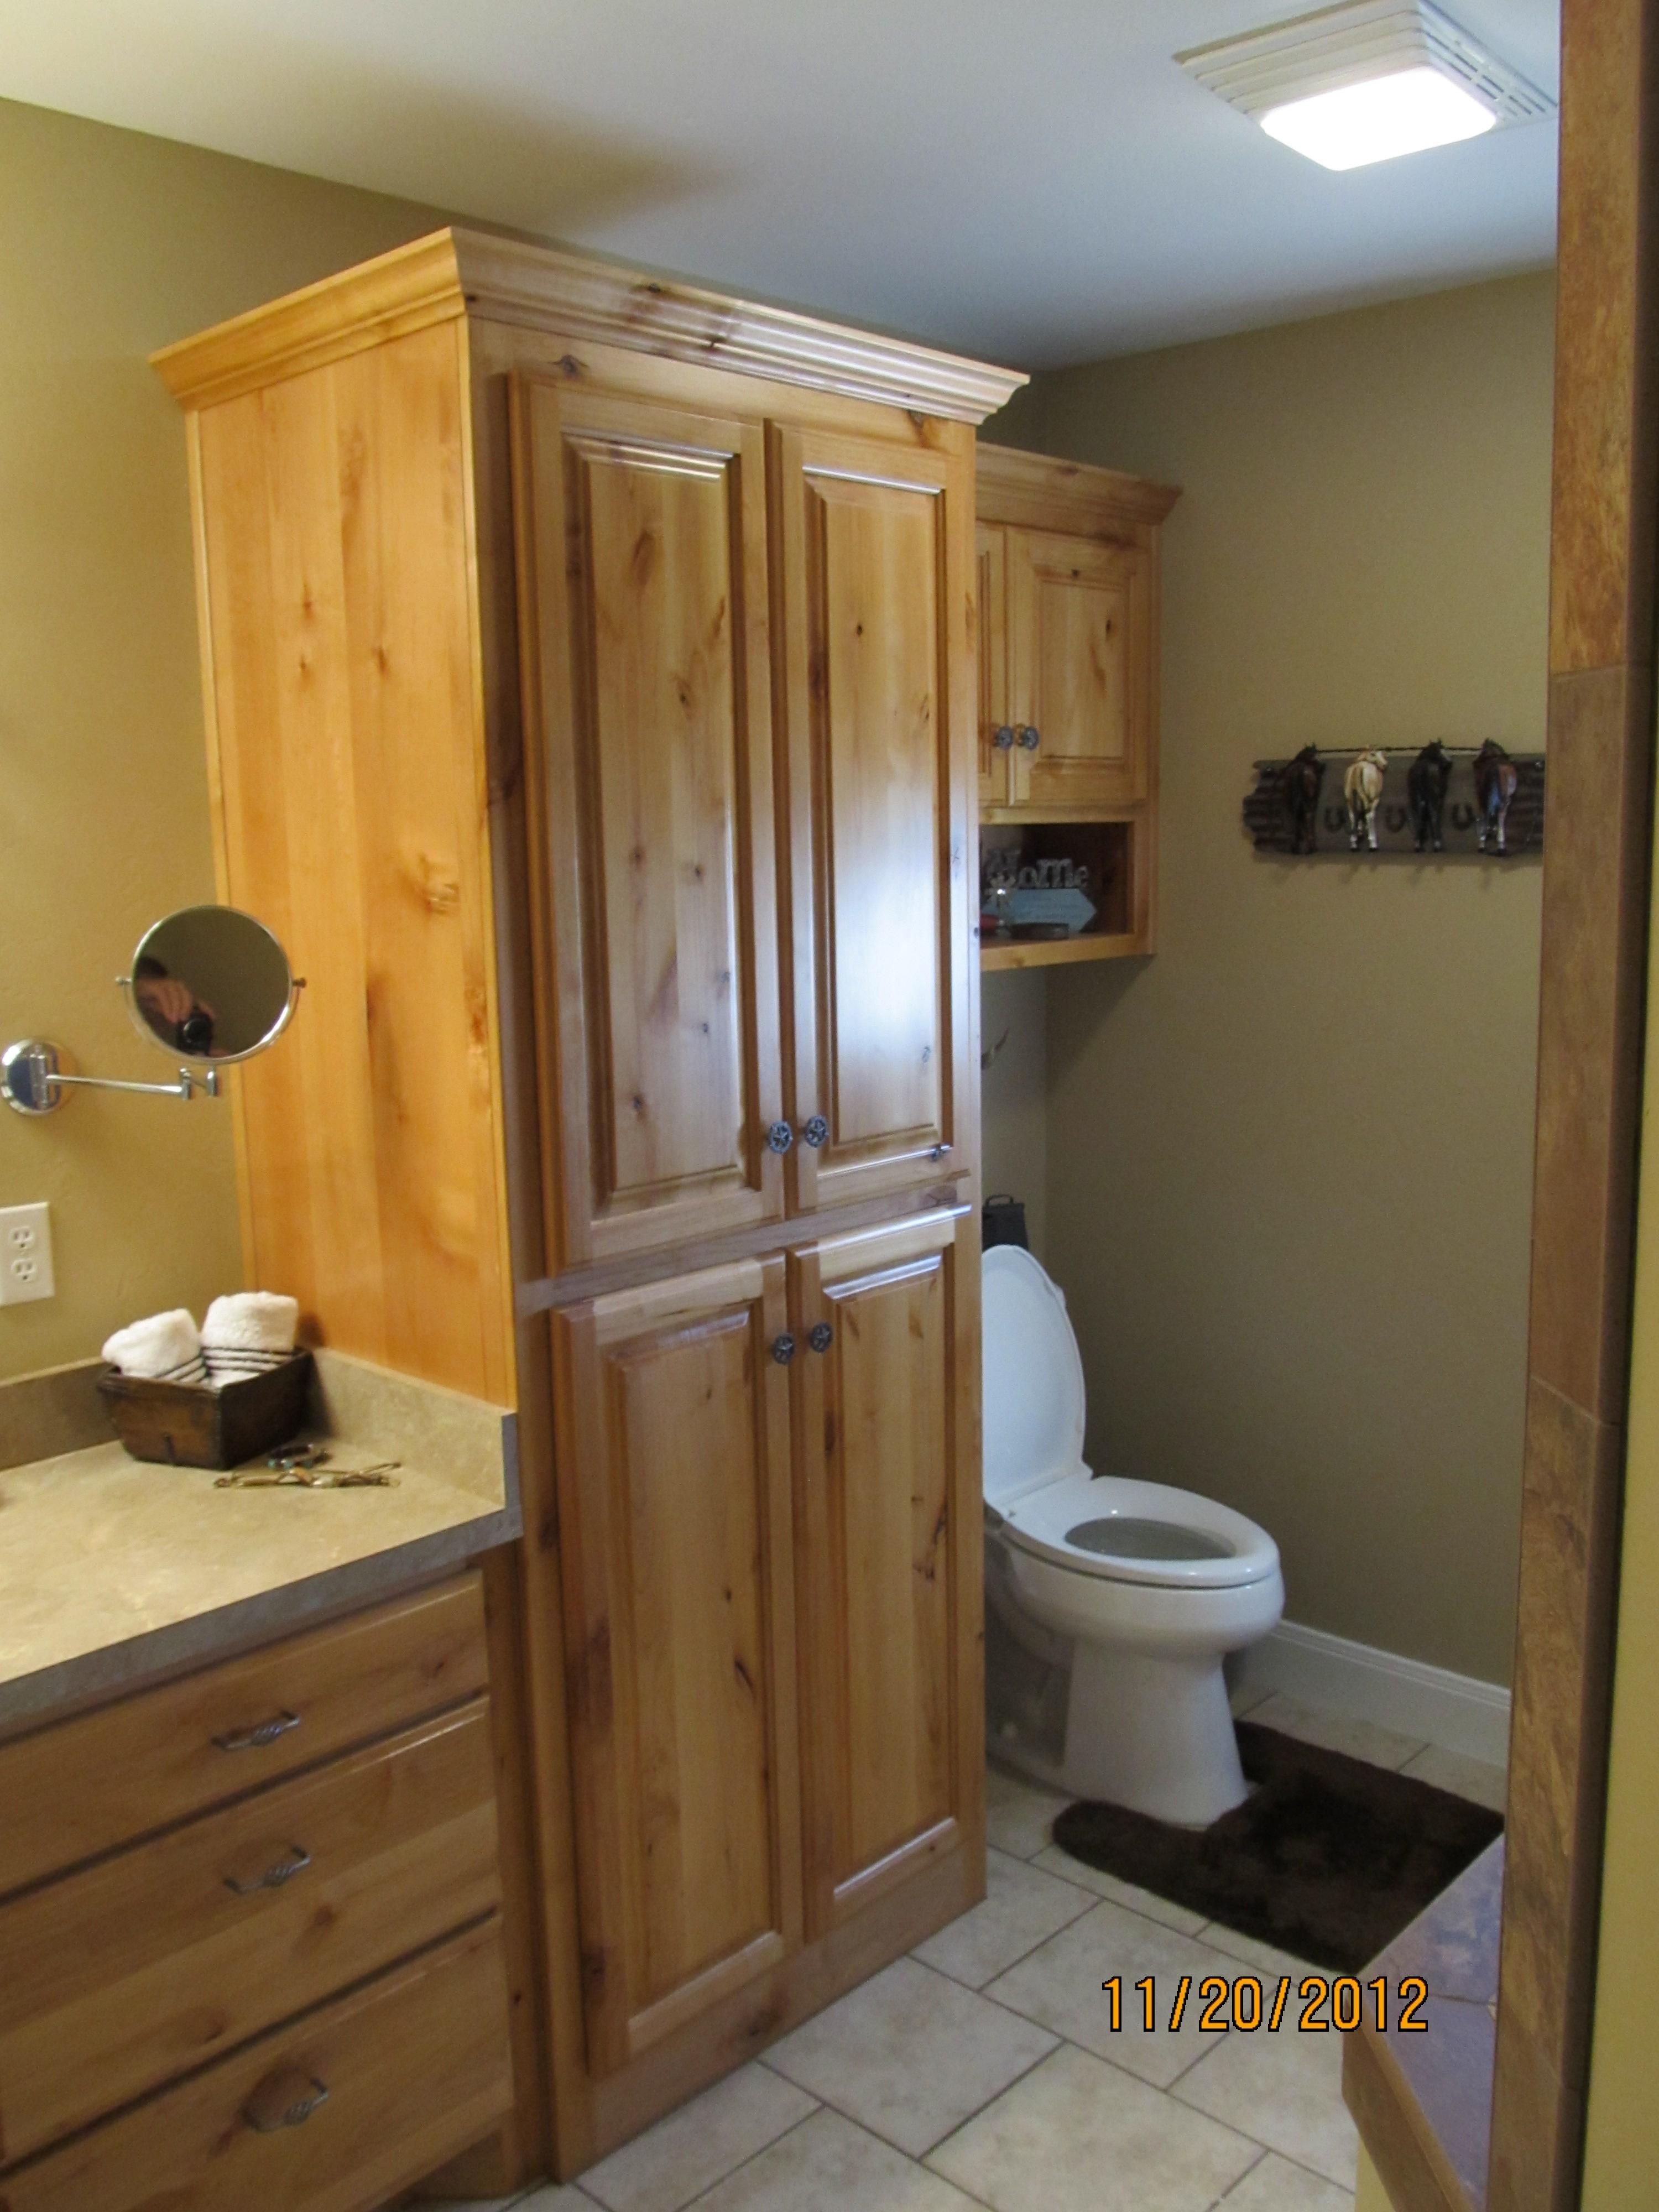 Restain bathroom cabinets oklahoma city designs deebonk for Bathroom cabinets okc